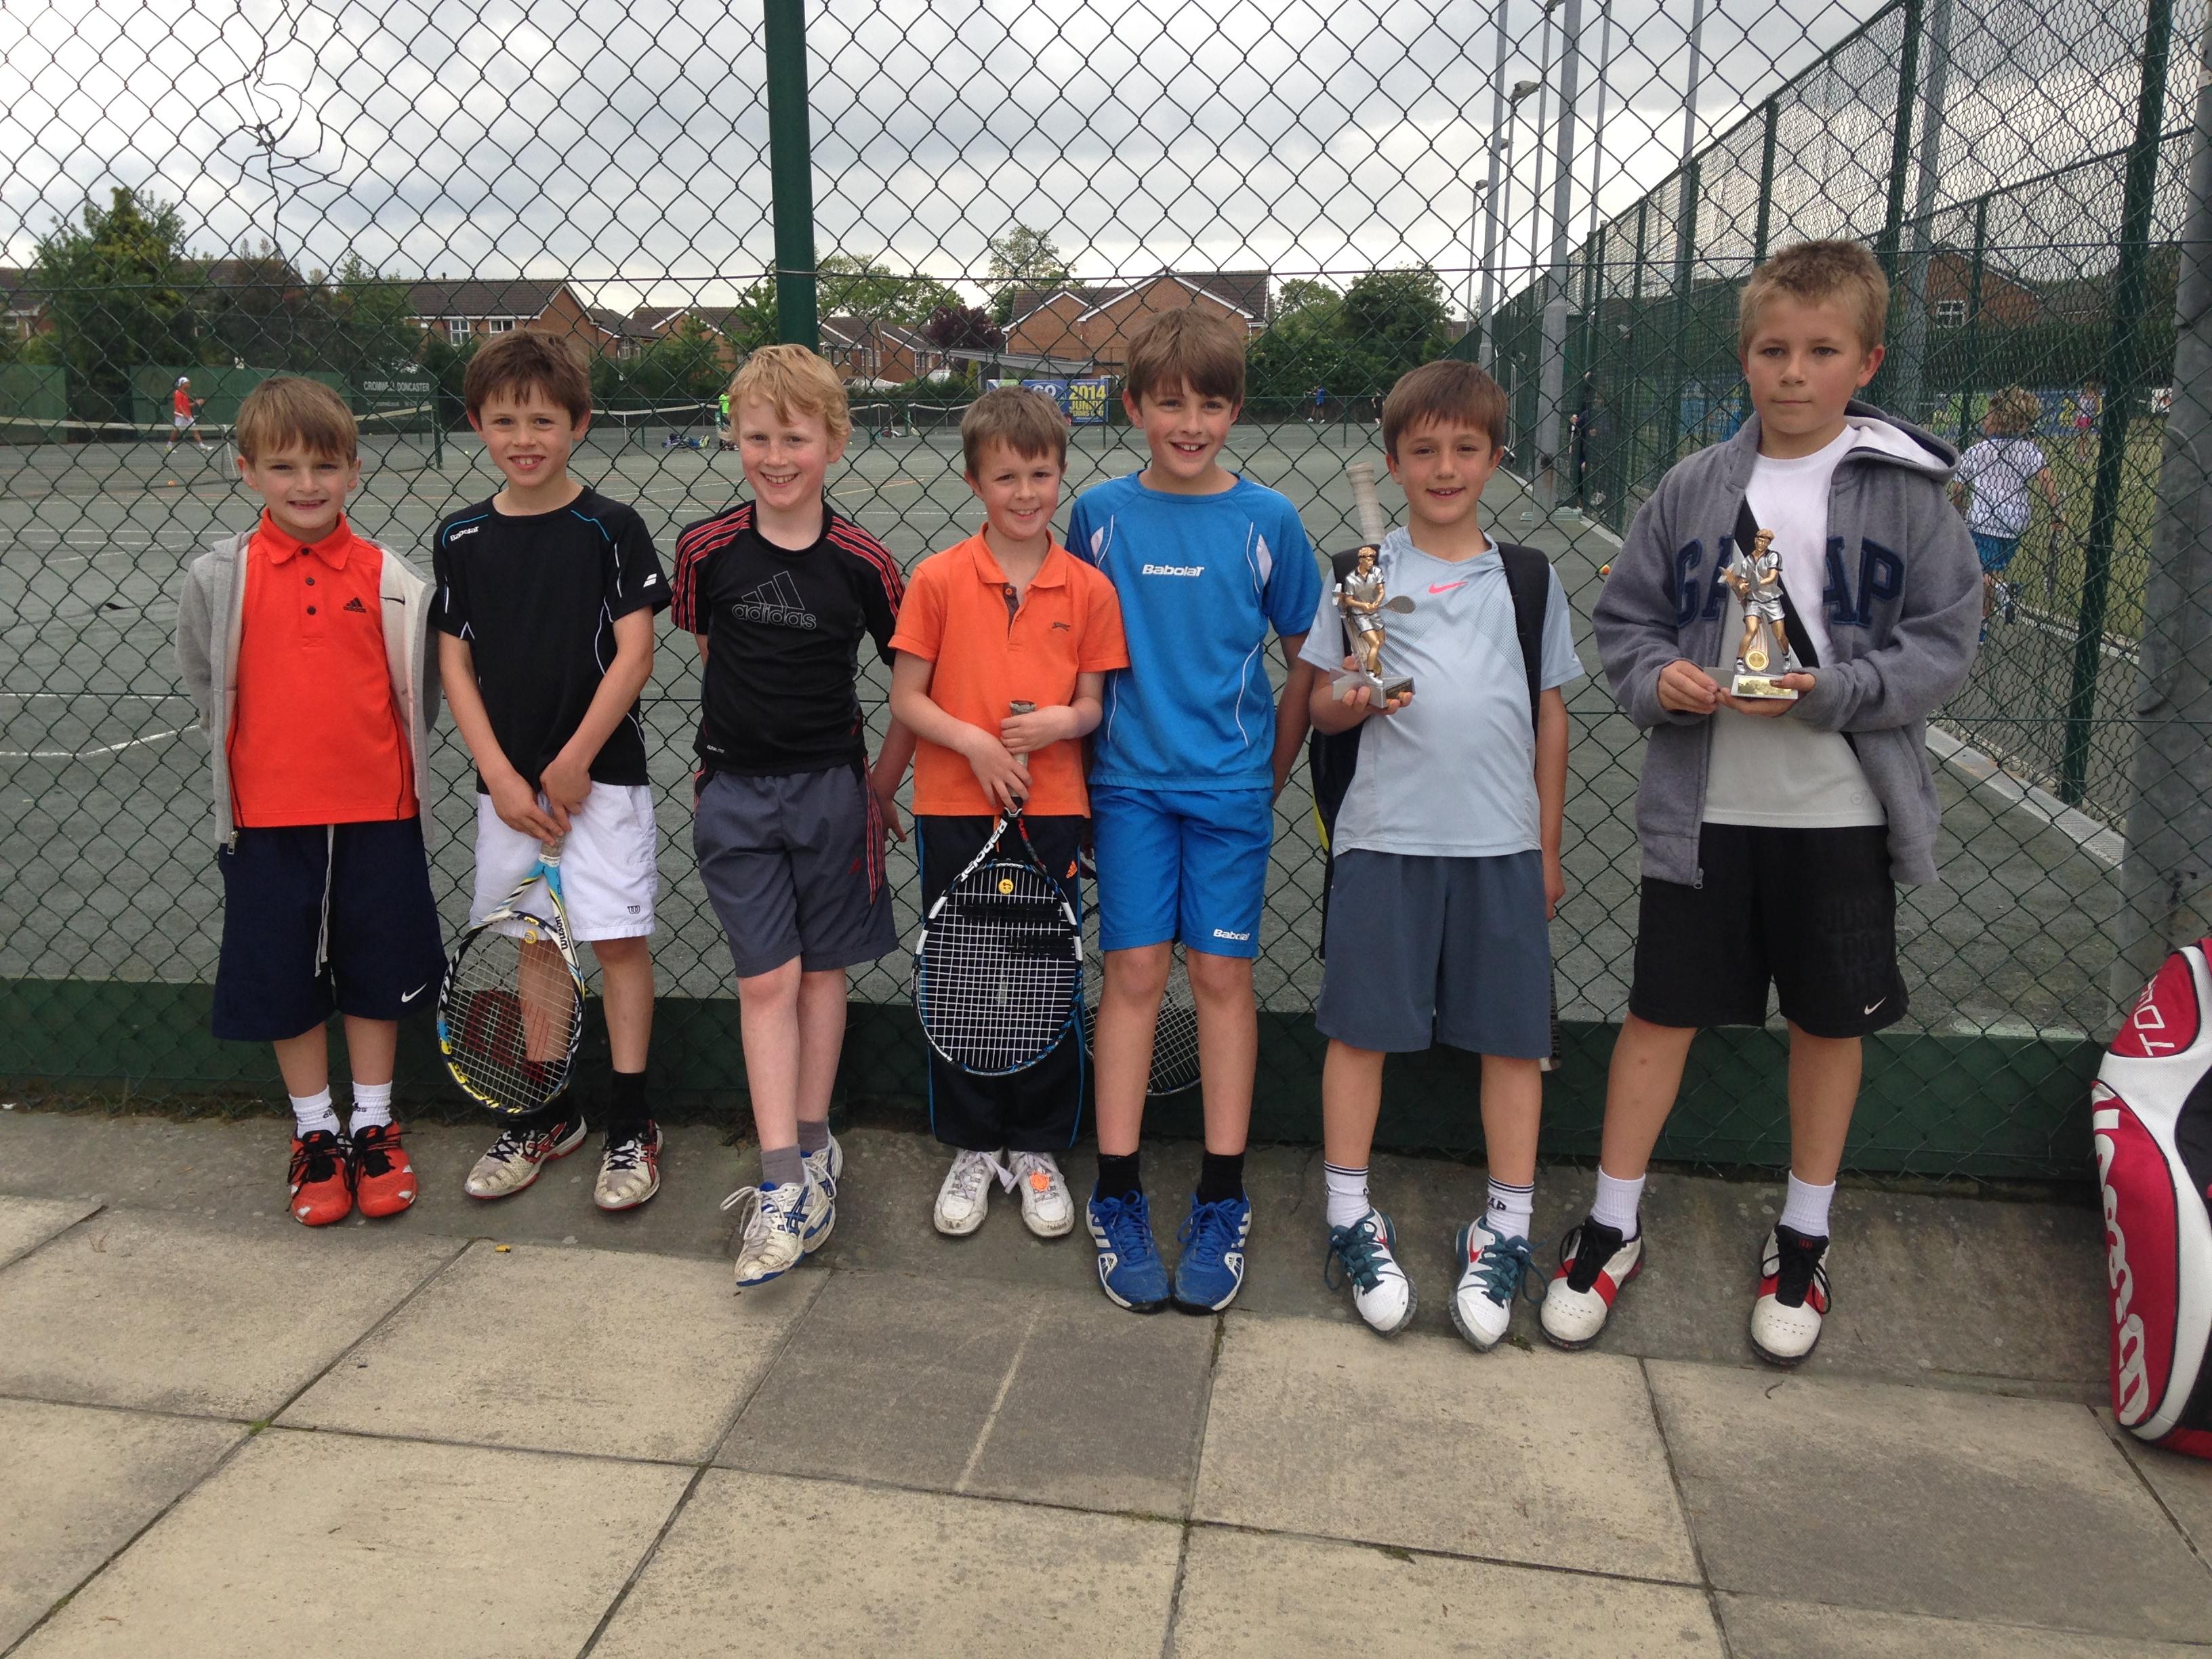 Spring Bank Round-Up - Thongsbridge Tennis and Sports Club